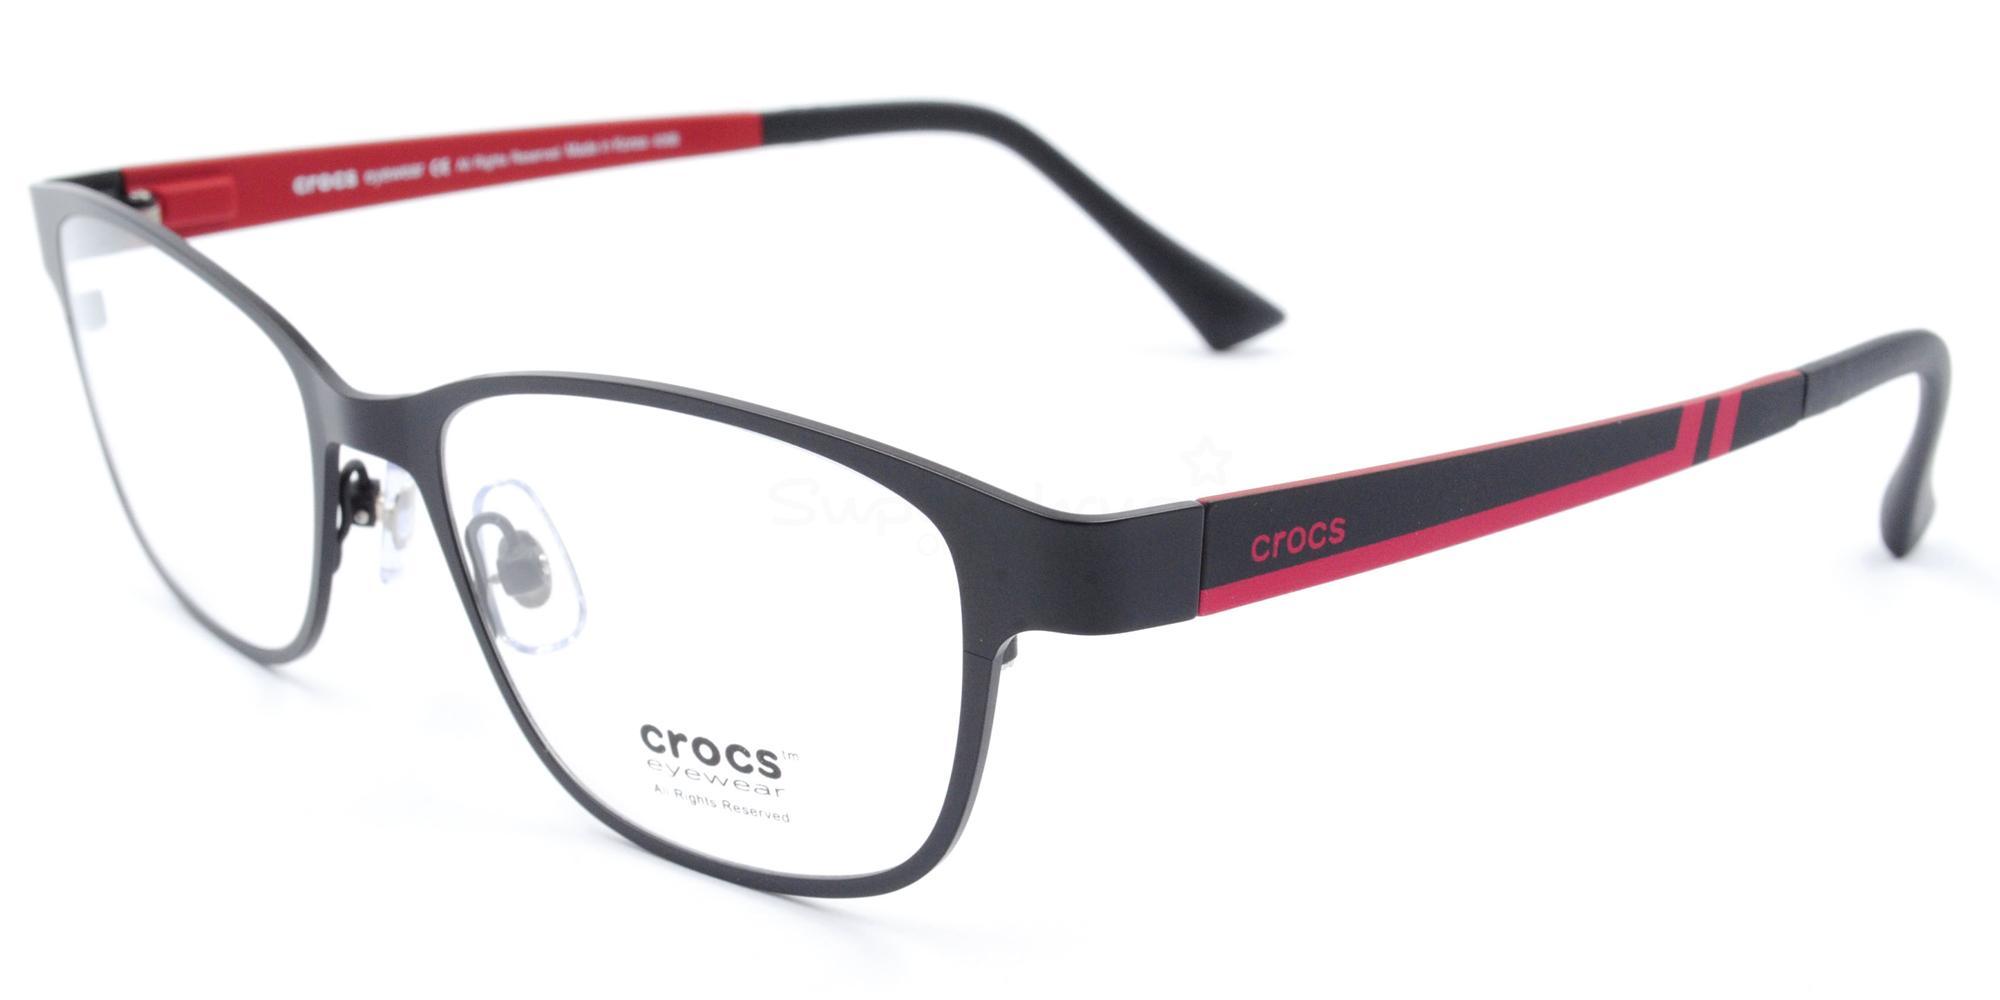 20RD CF625 , Crocs Eyewear